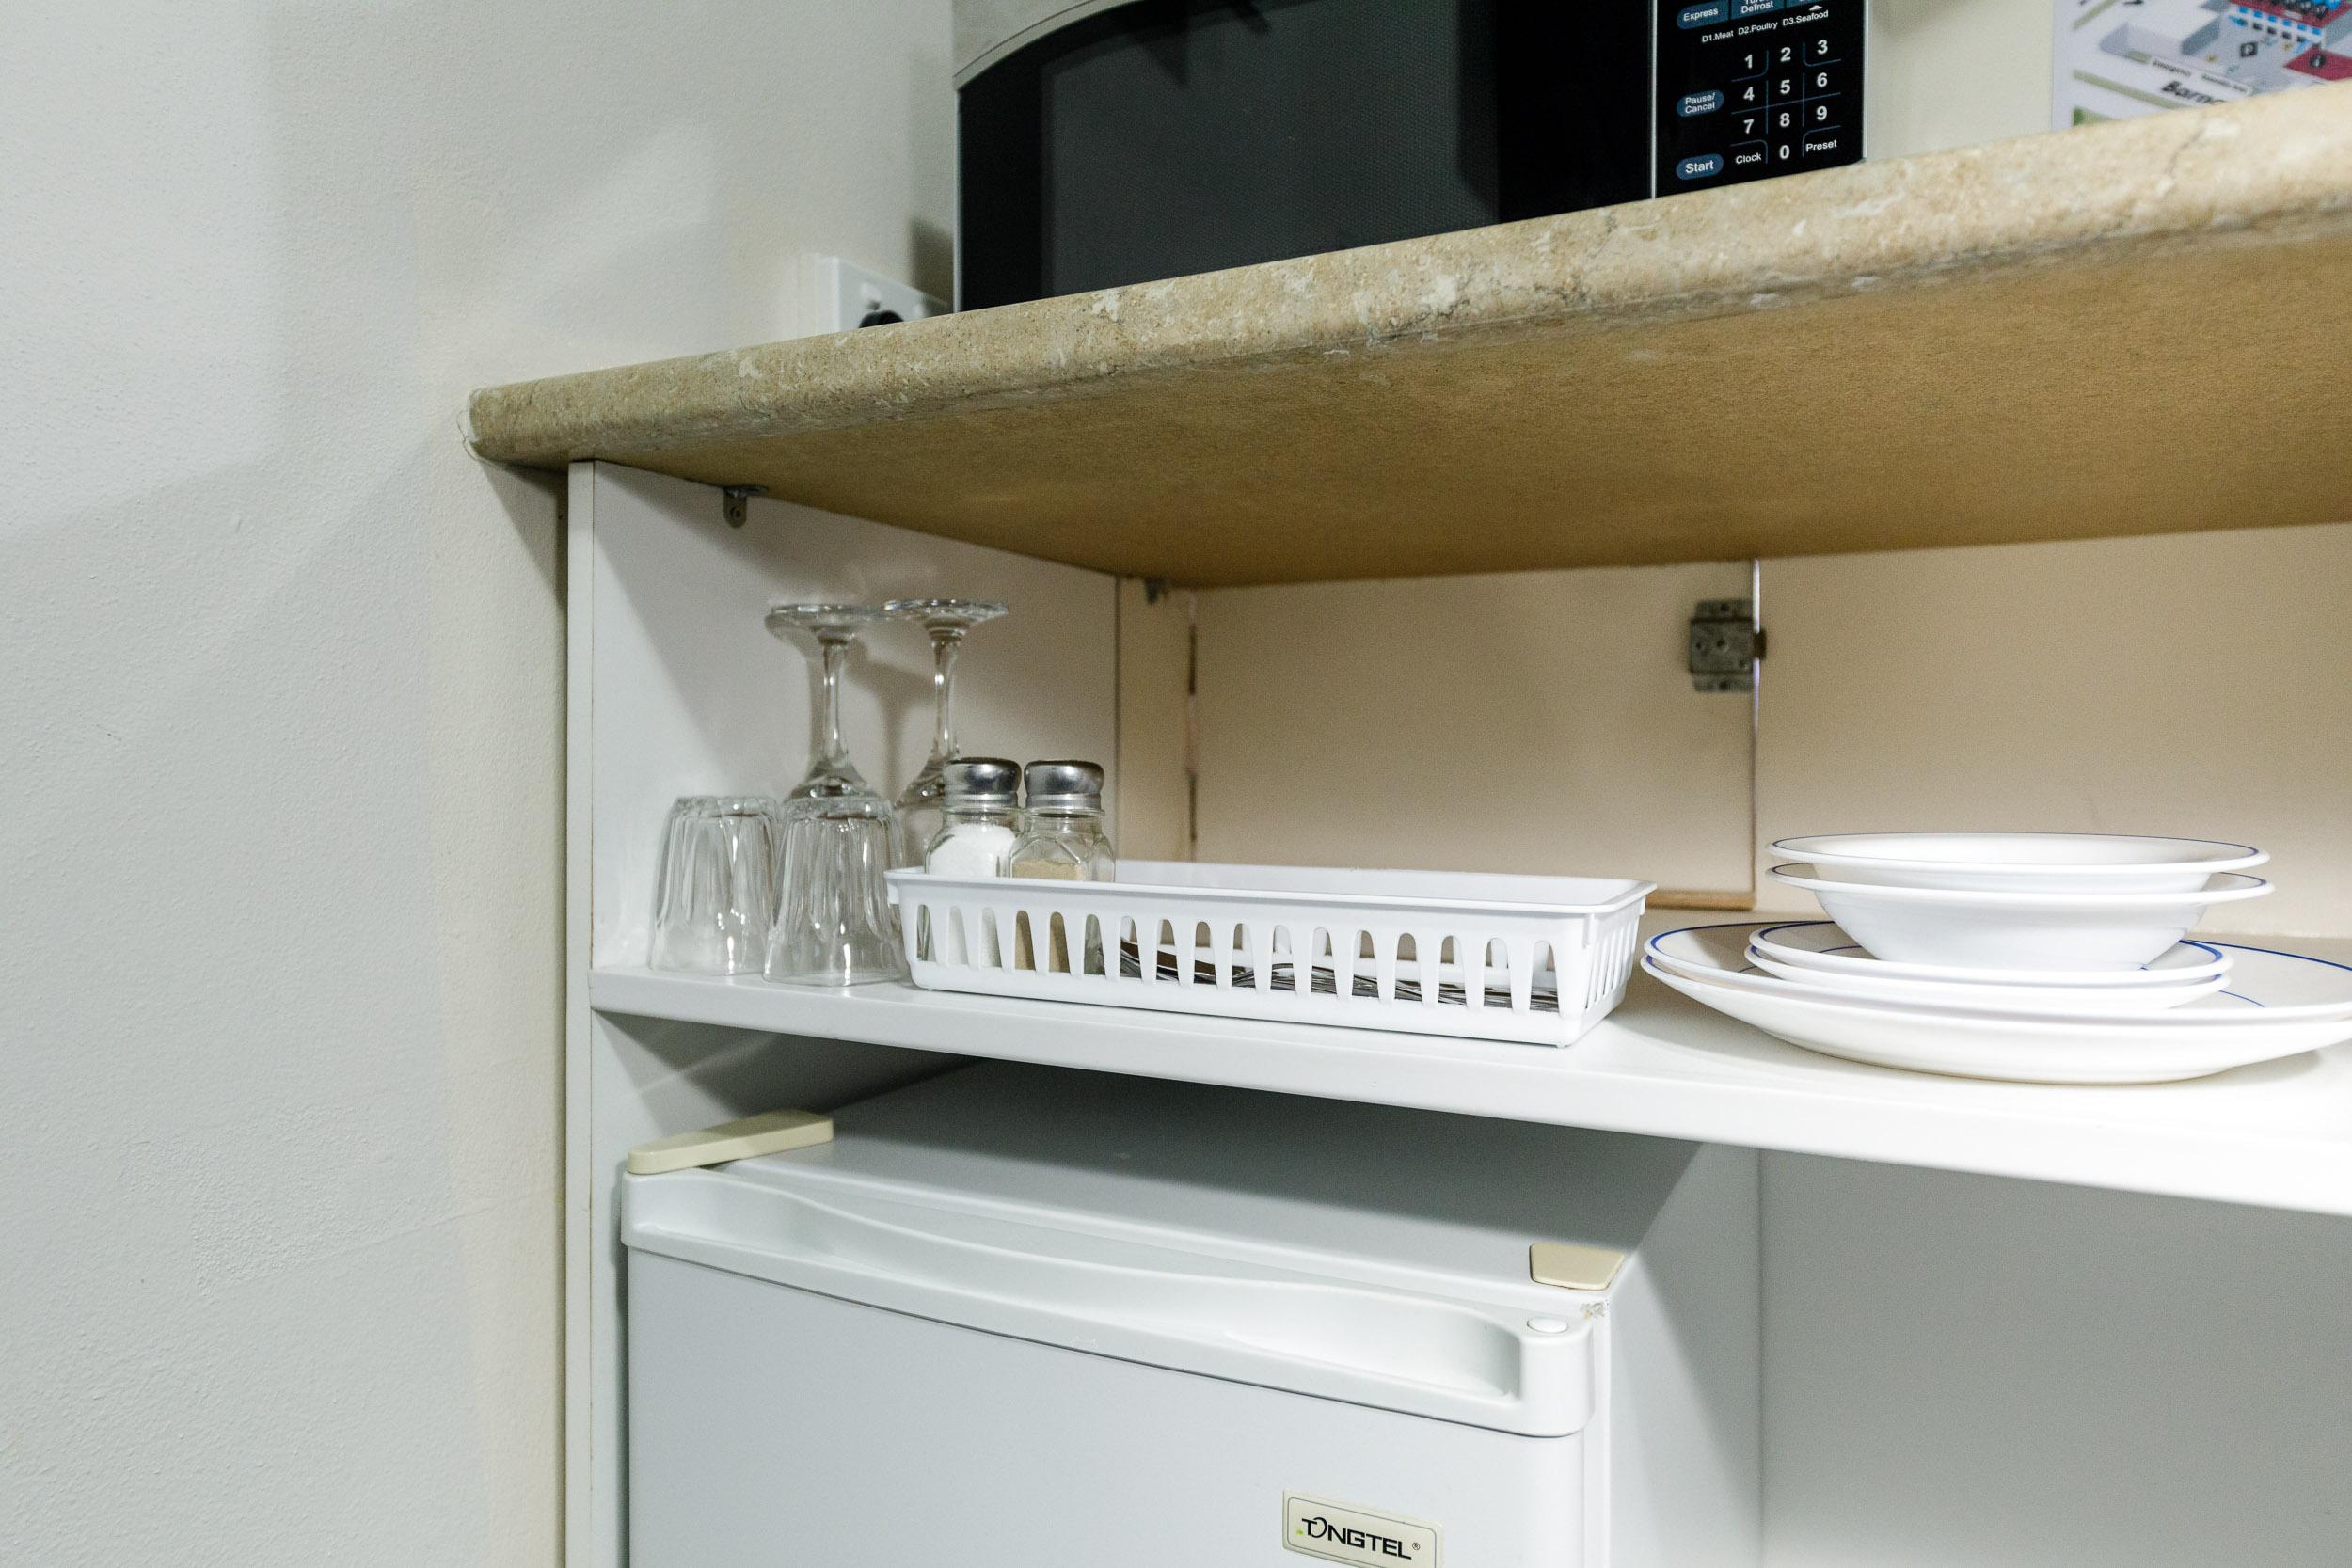 Microwave & Amenities